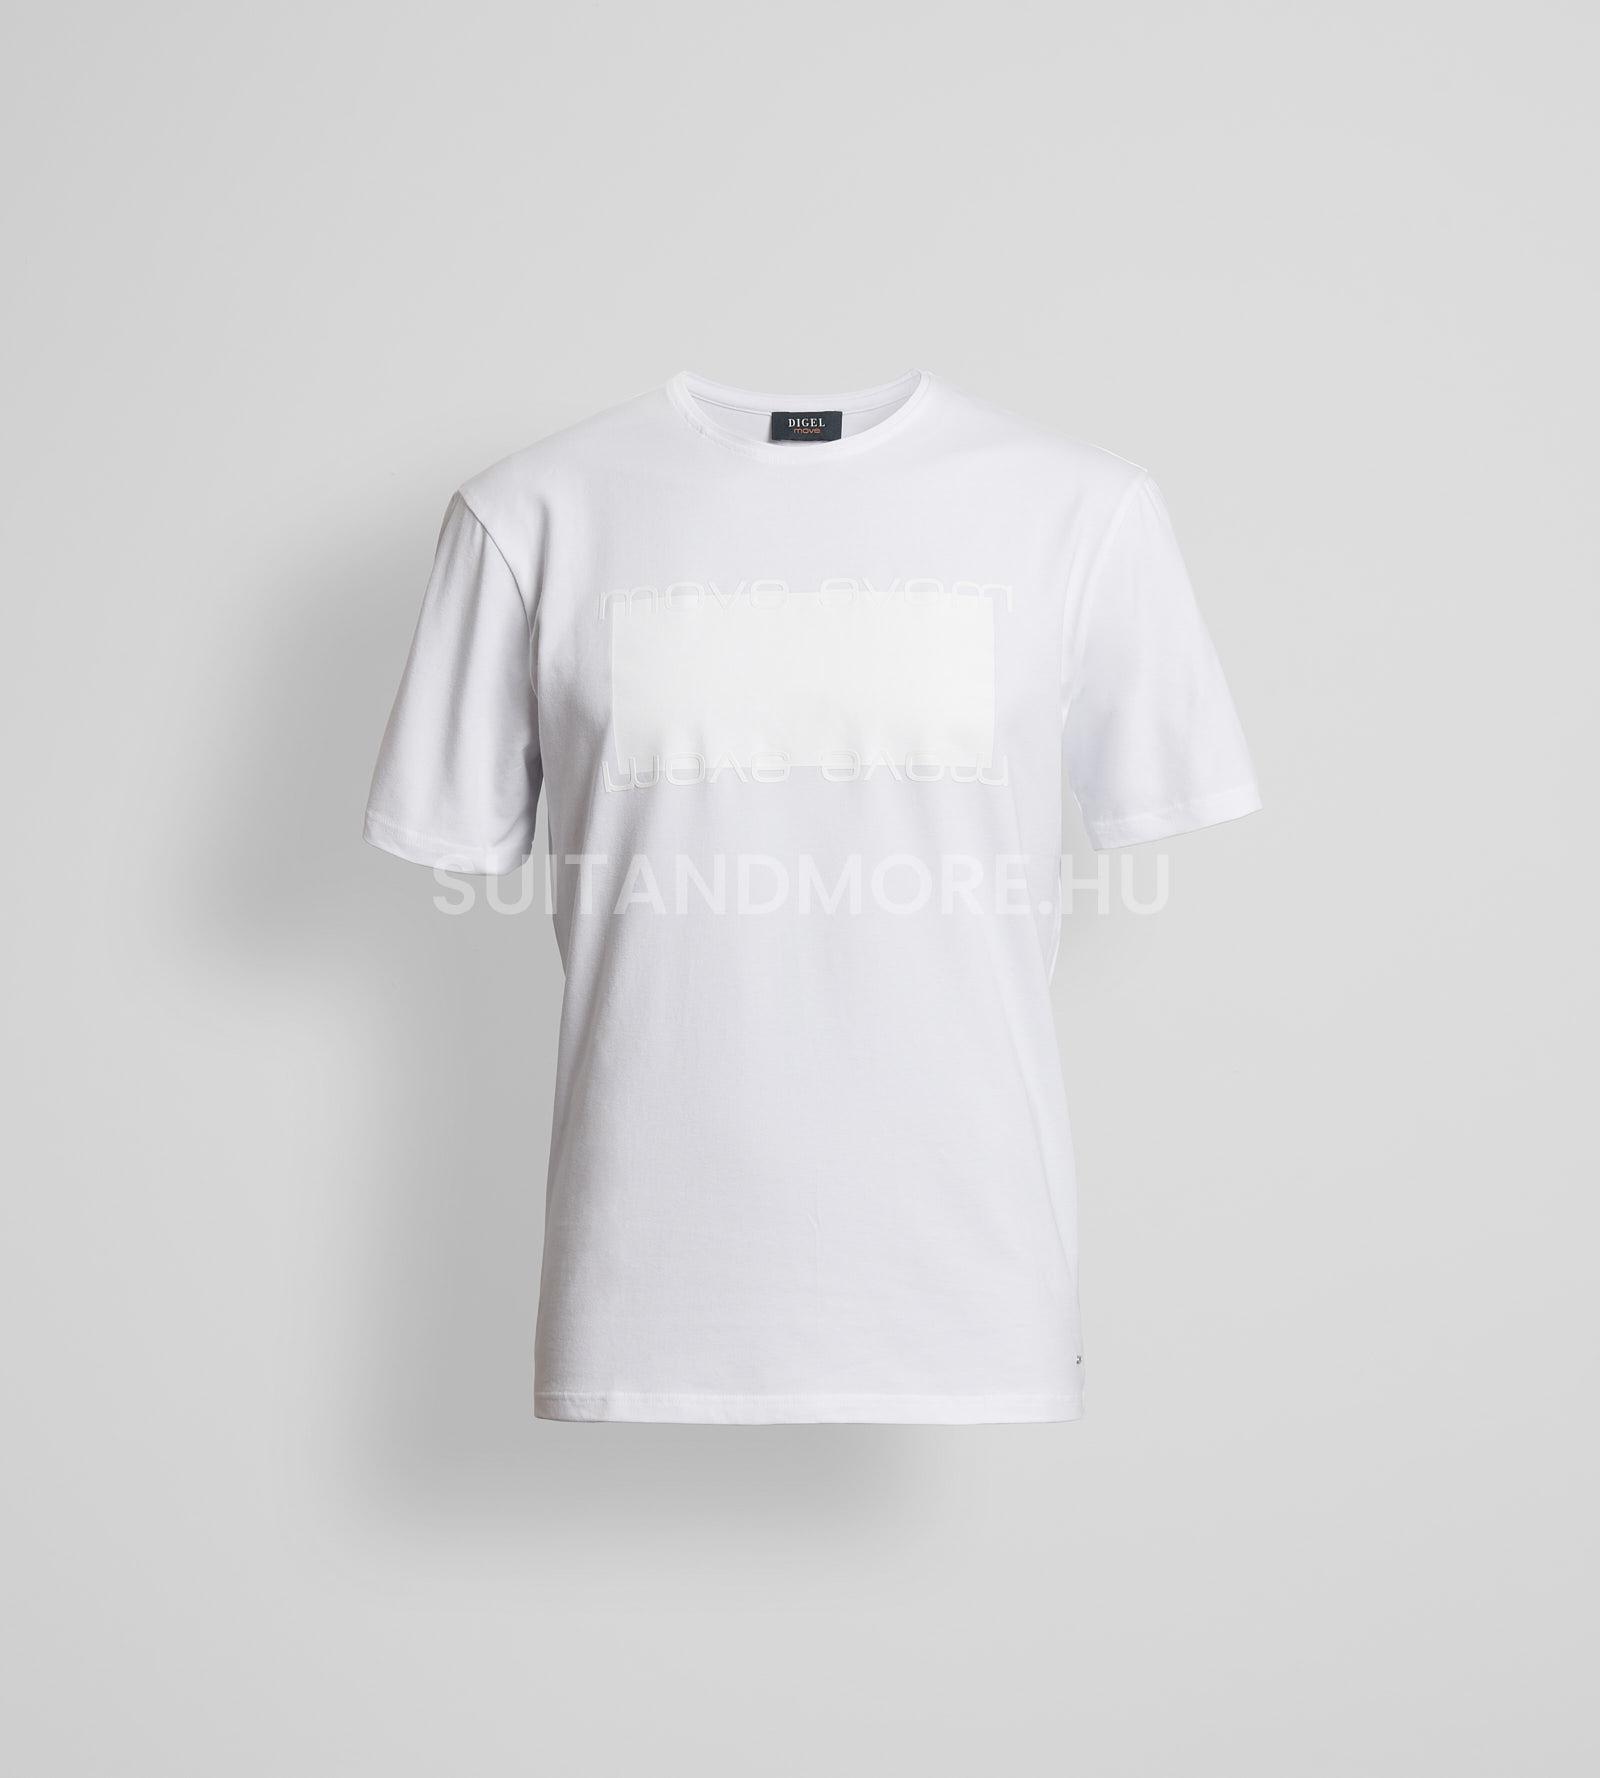 DIGEL-fehér-slim-fit-kerek-nyakú-póló-ANANI-1-2-1108123-80-01